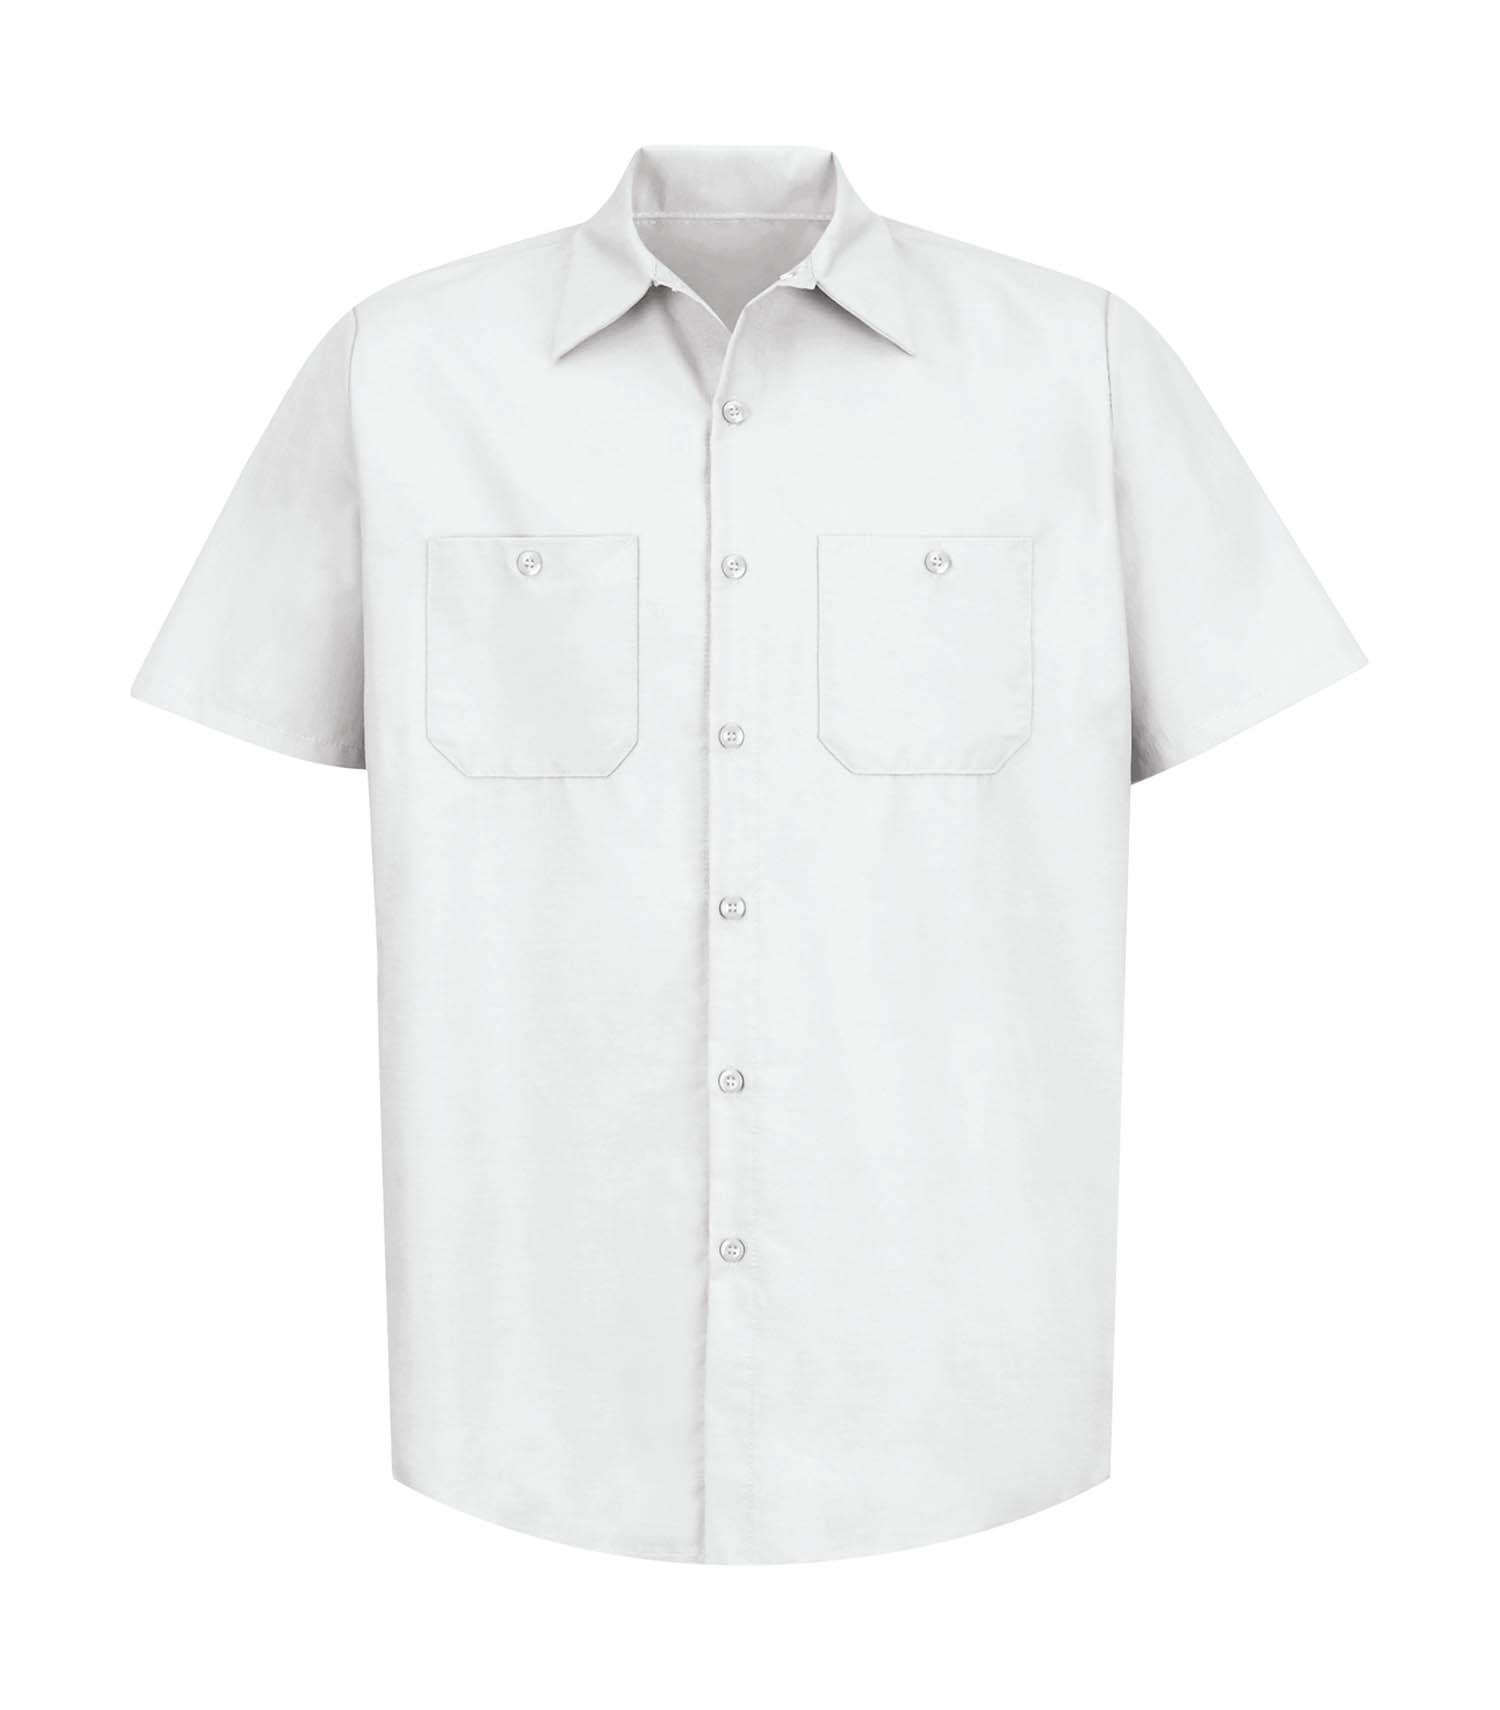 Custom Printed Work Shirts Coastal Reign